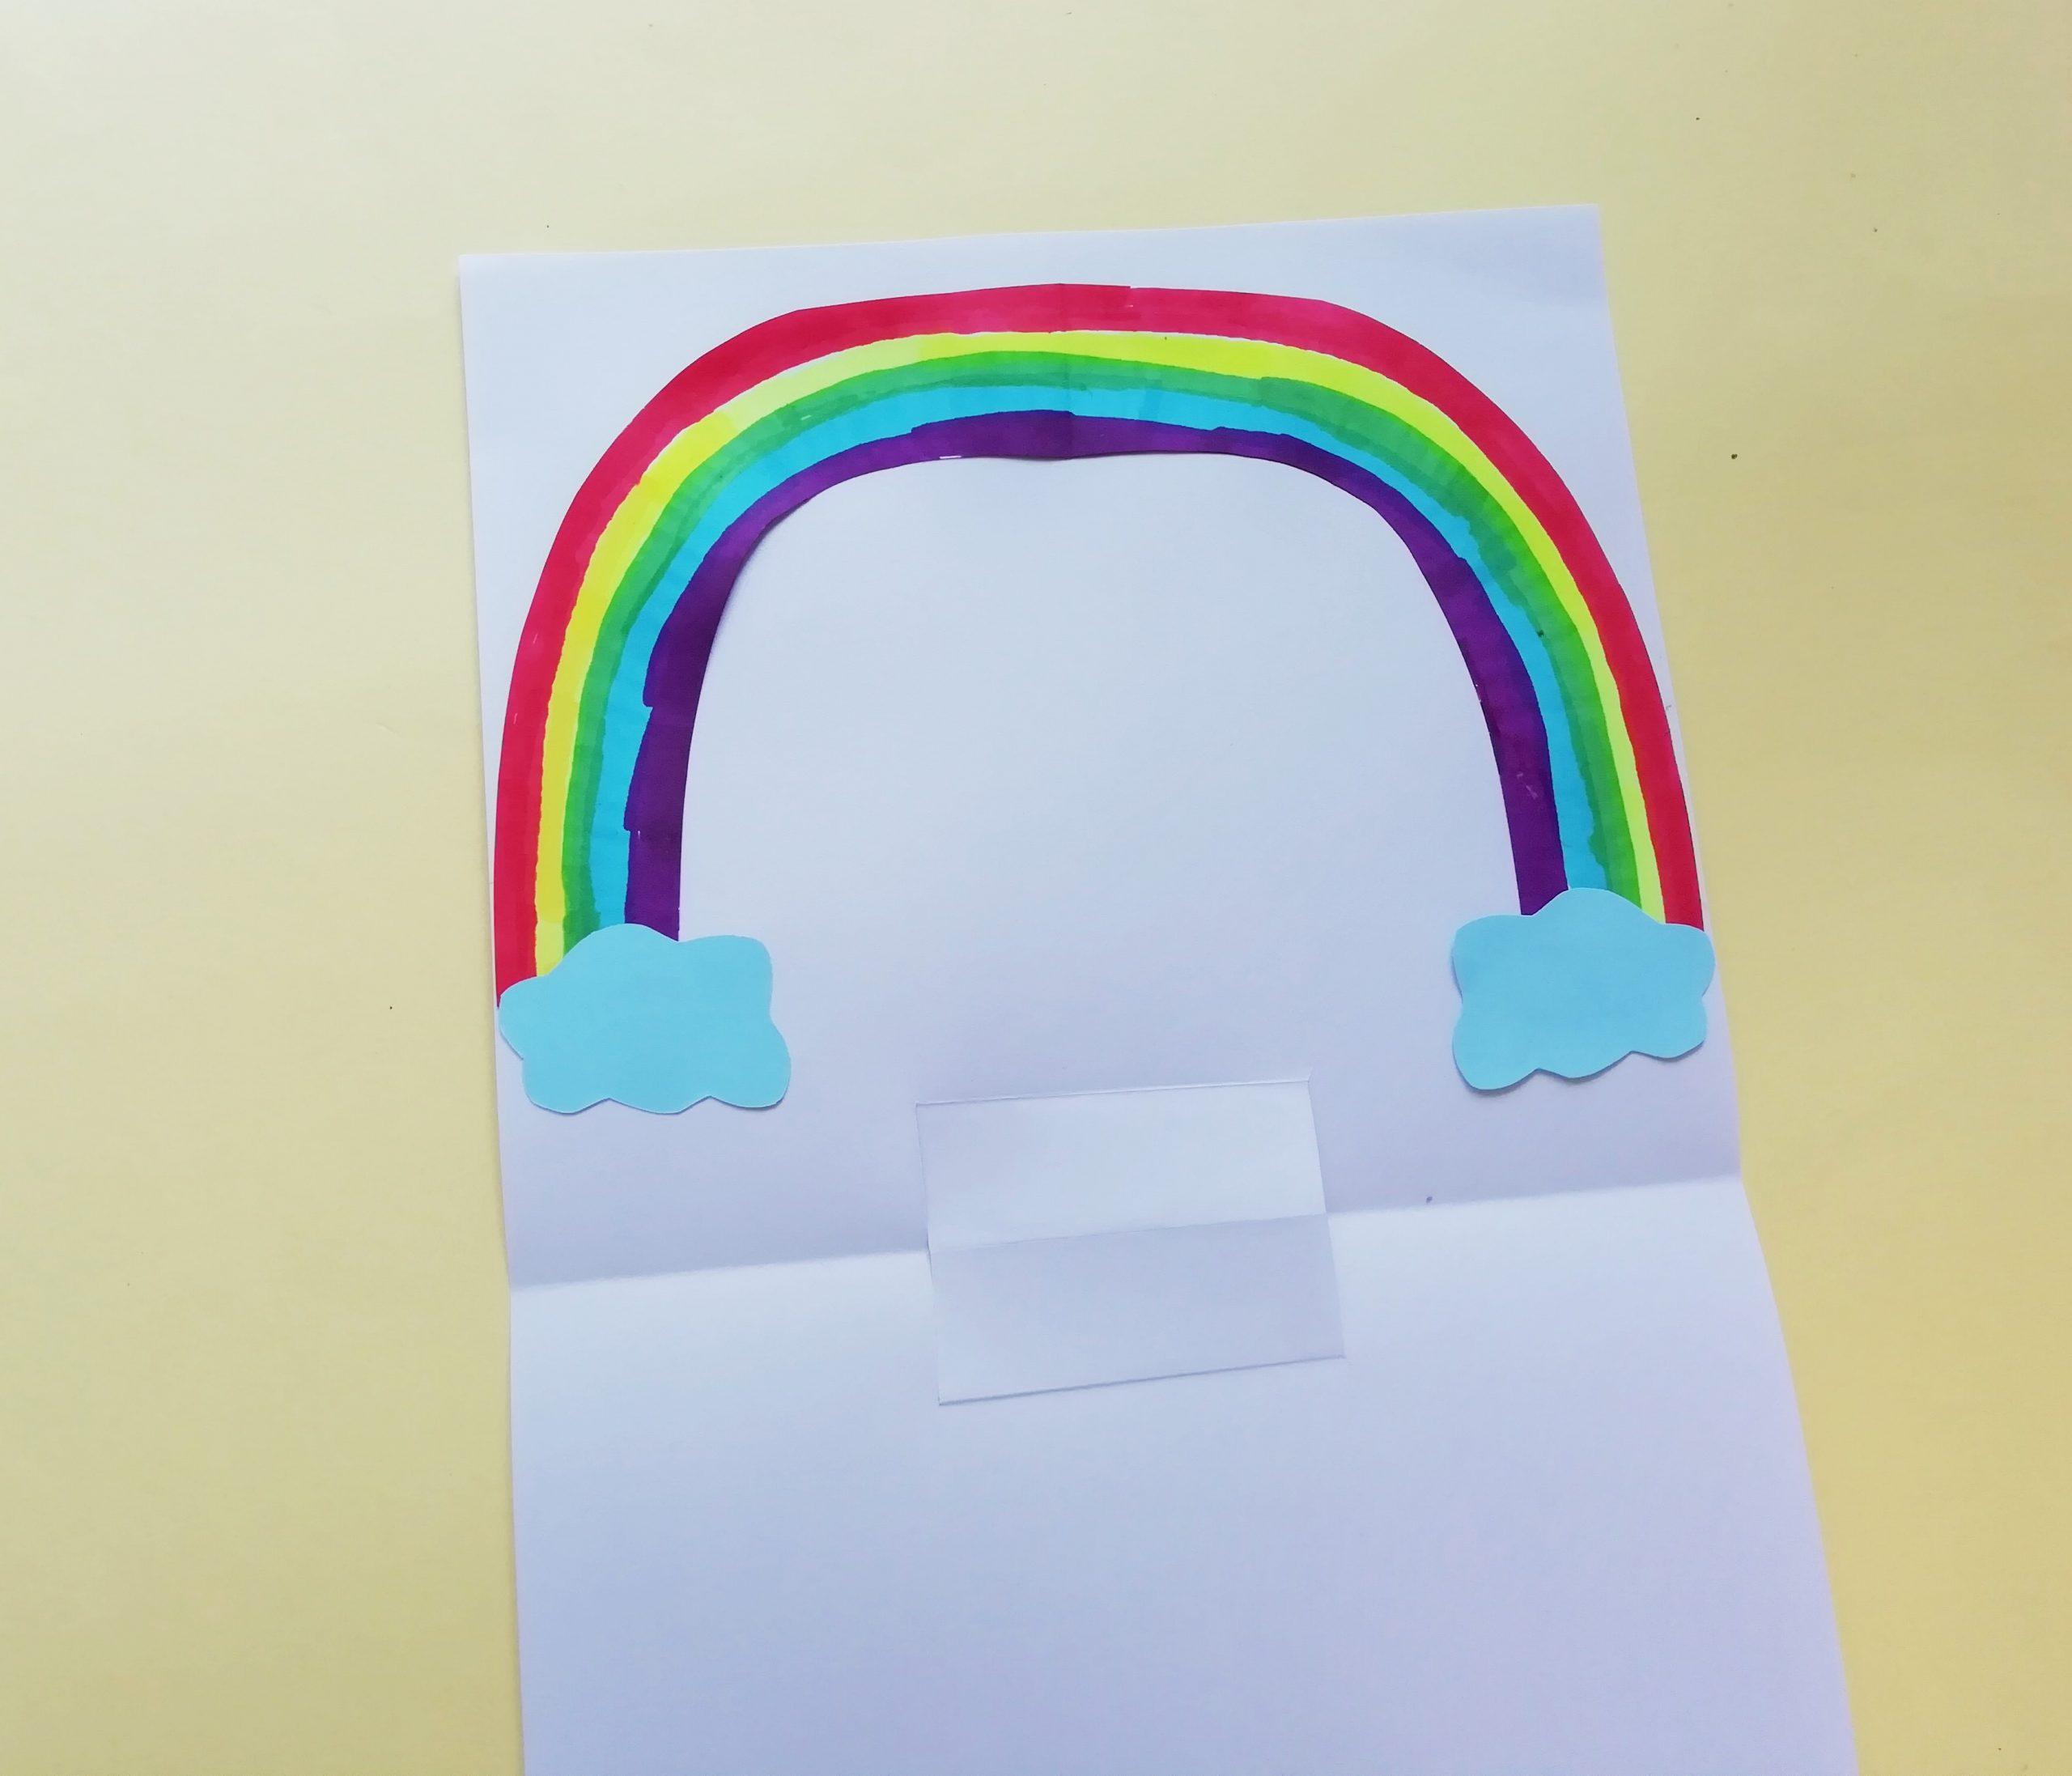 rainbow and cloud craft